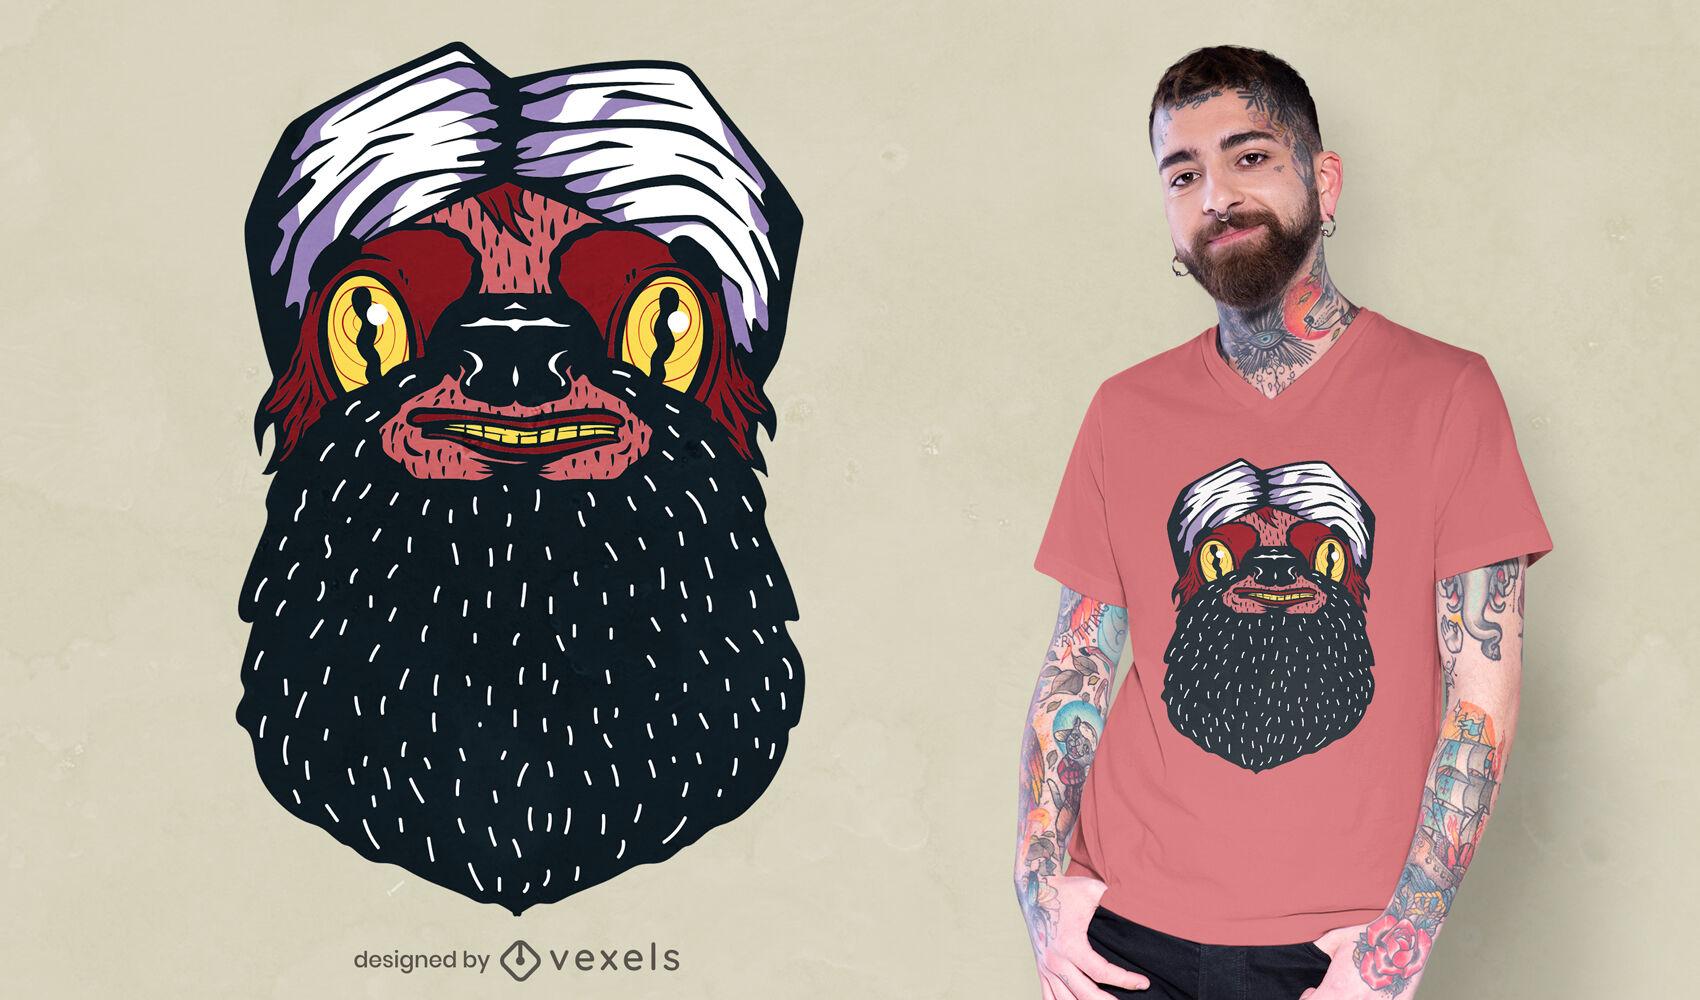 Turban sloth t-shirt design